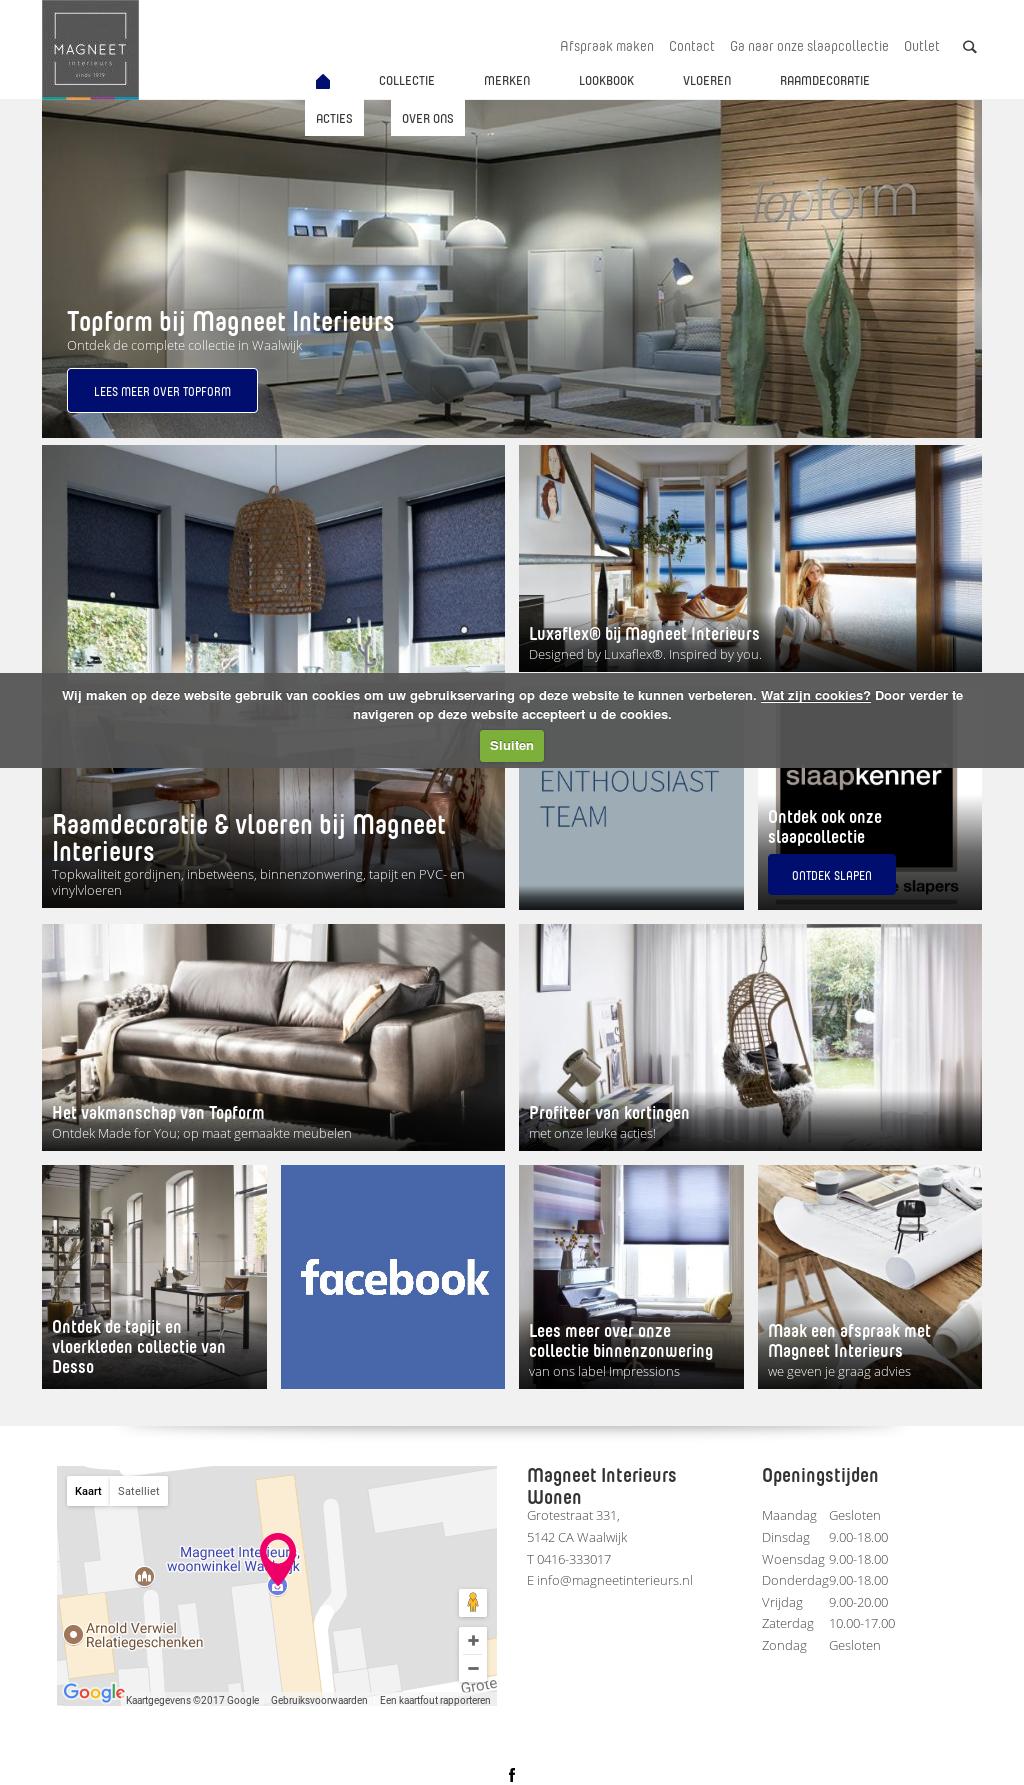 Magneet Interieurs Waalwijk Company Profile - Revenue, Number of ...